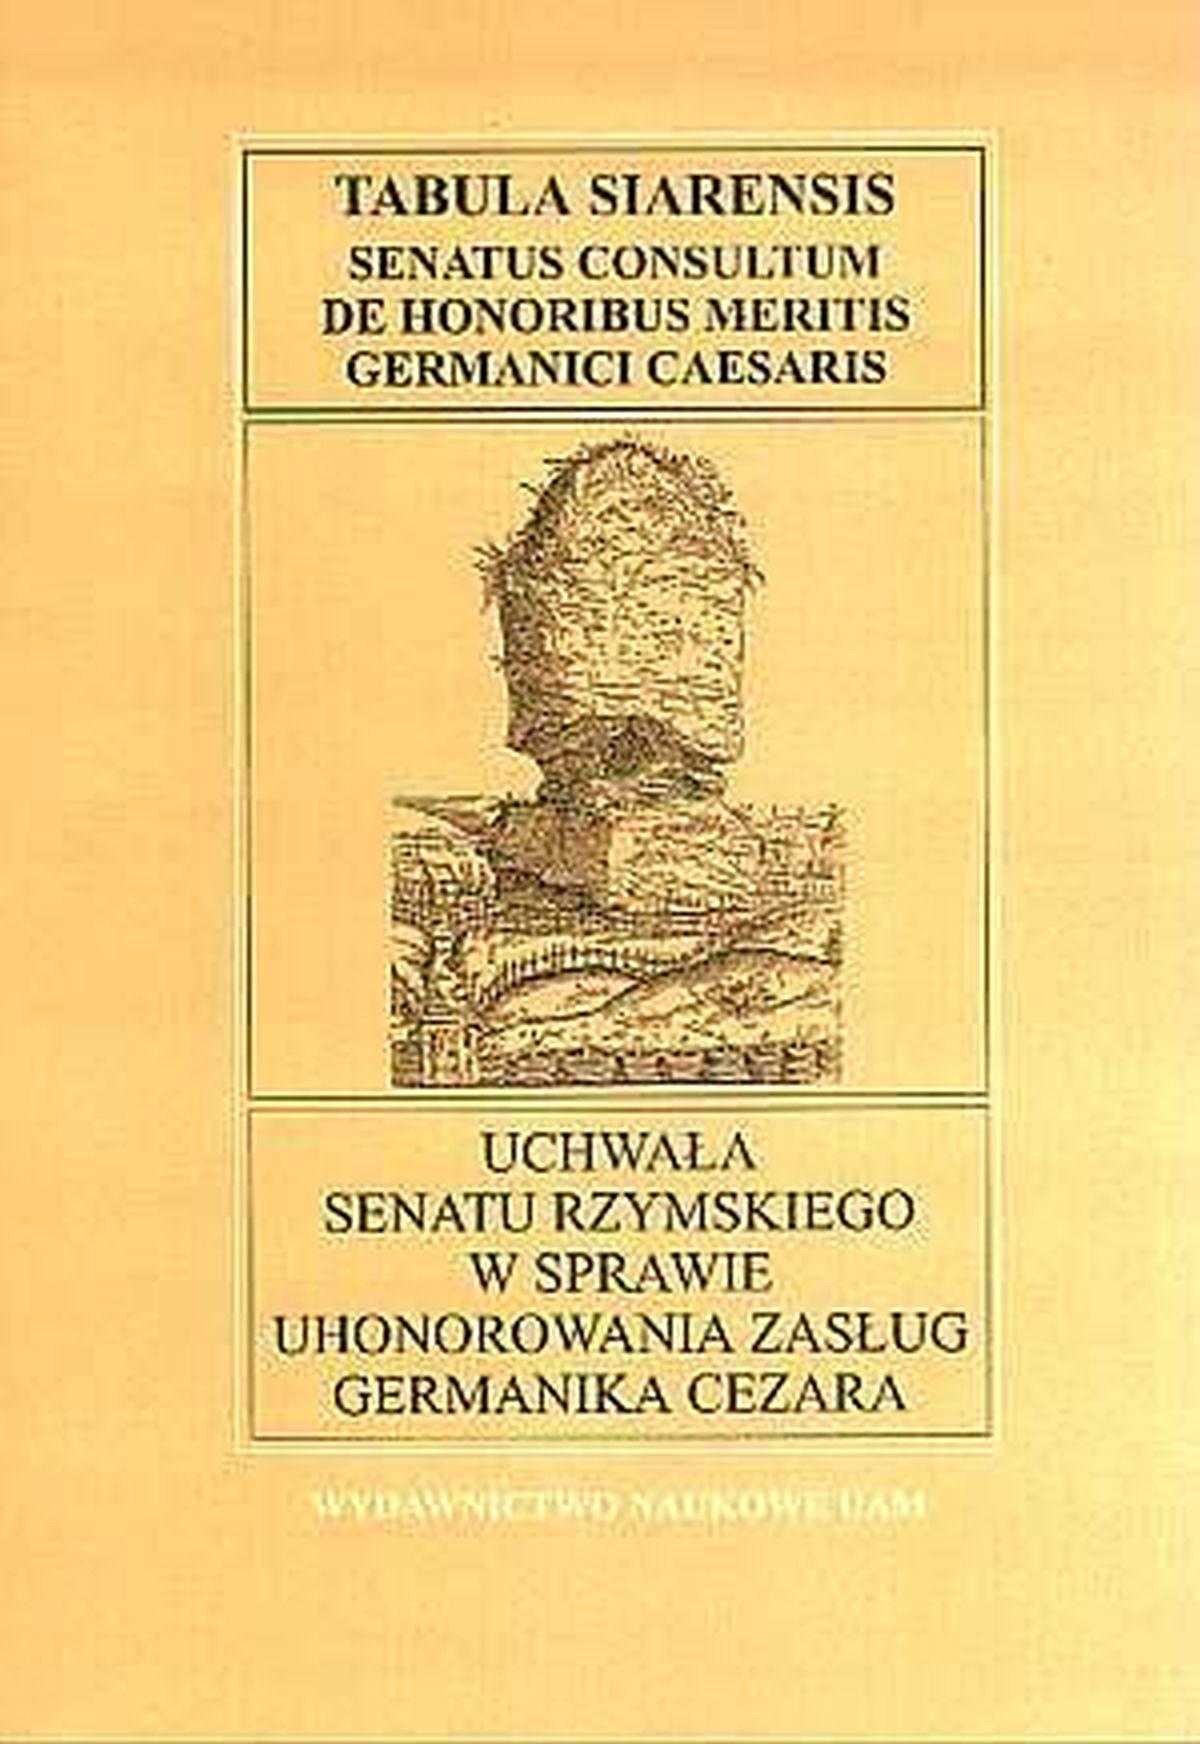 Uchwała senatu rzymskiego w sprawie uhonorowania zasług Germanika Cezara / Tabula Siarensis Senatus consultum de honoribus meritis Germanici Caesaris